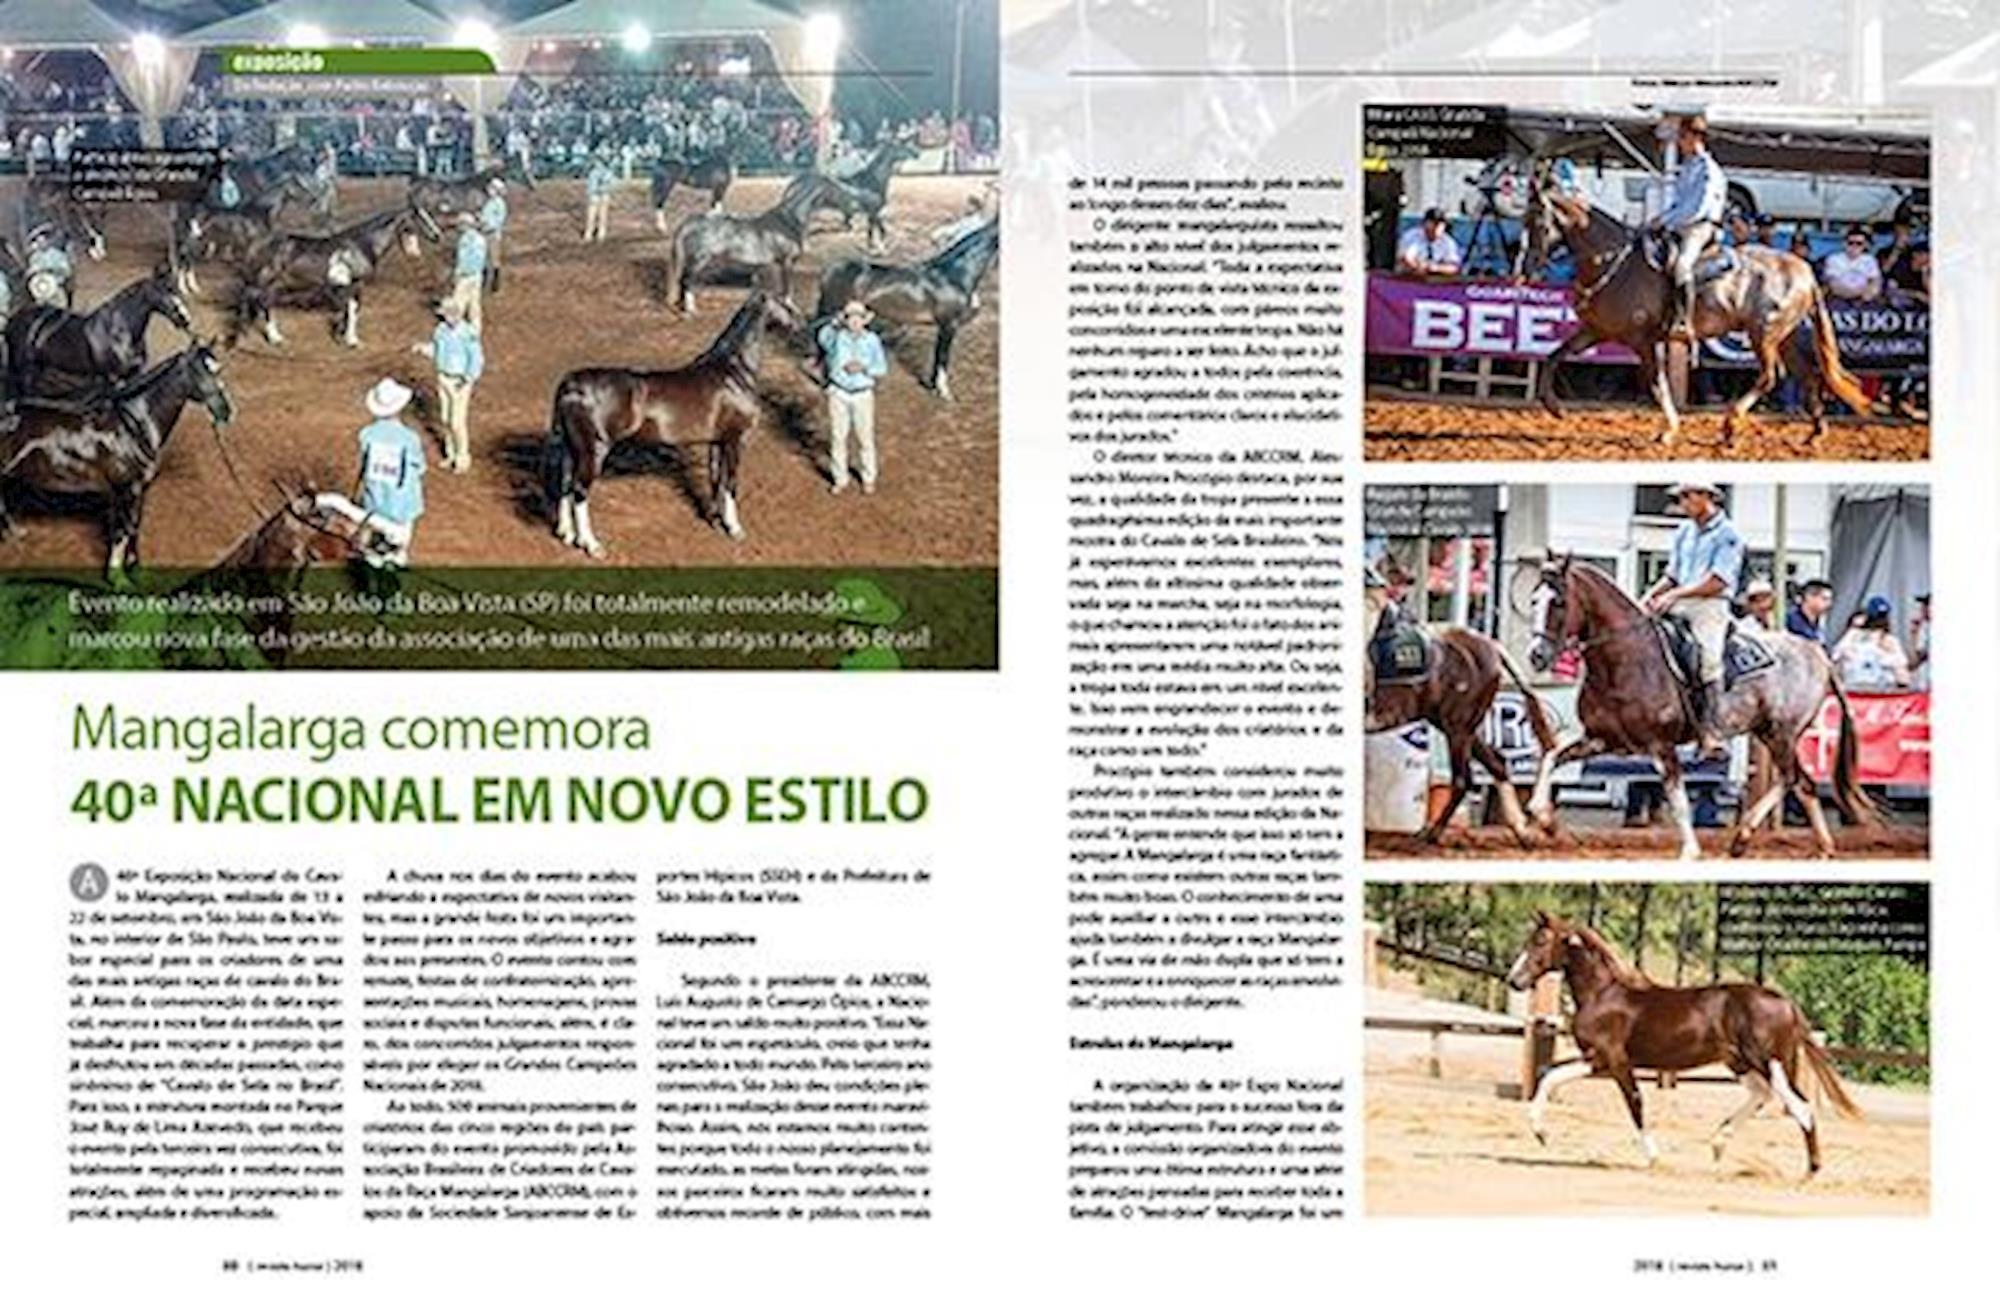 Revista Horse, WEG, Jogos Equestres Mundiais, Tryon, CBH, Mangalarga,